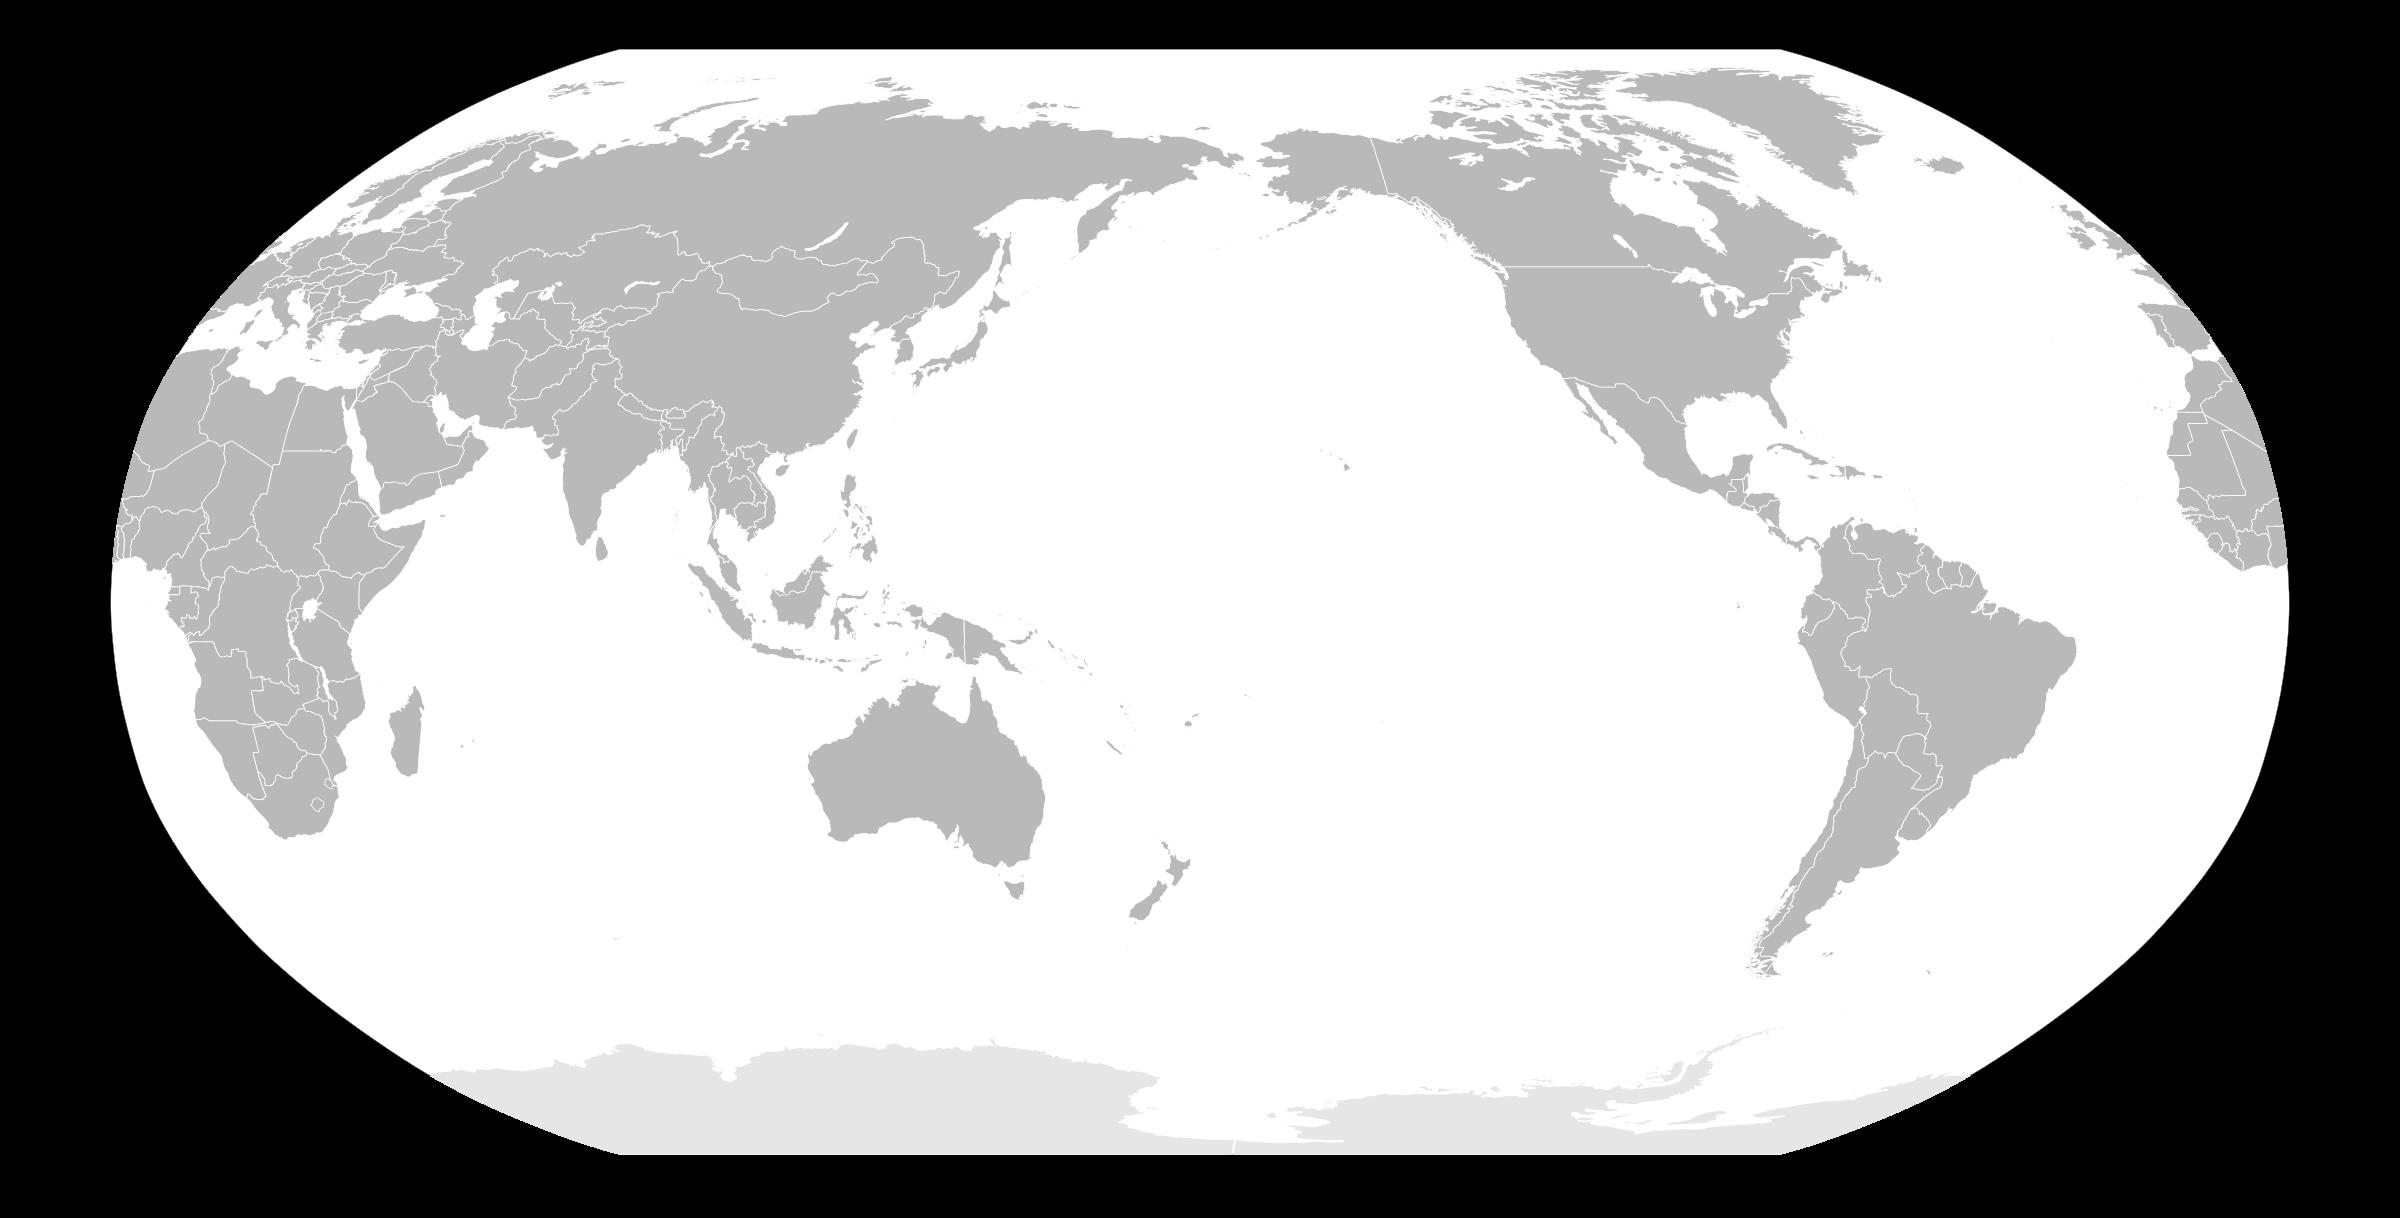 Japan clipart map japan. World pov big image